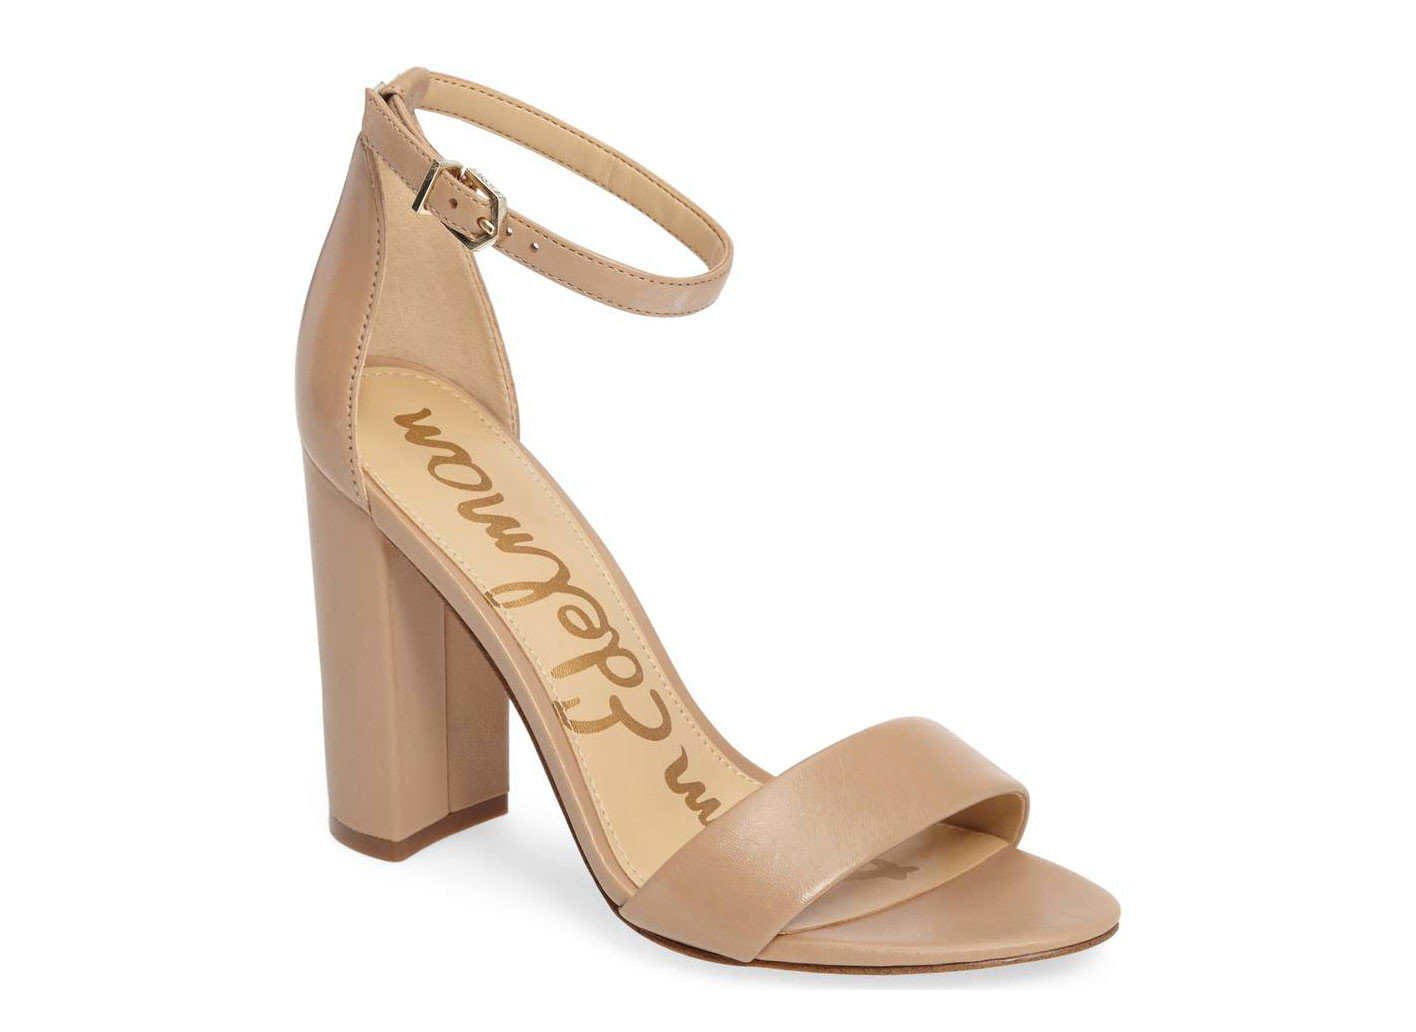 Celebs Style + Design Travel Shop footwear high heeled footwear sandal shoe beige basic pump product design outdoor shoe product